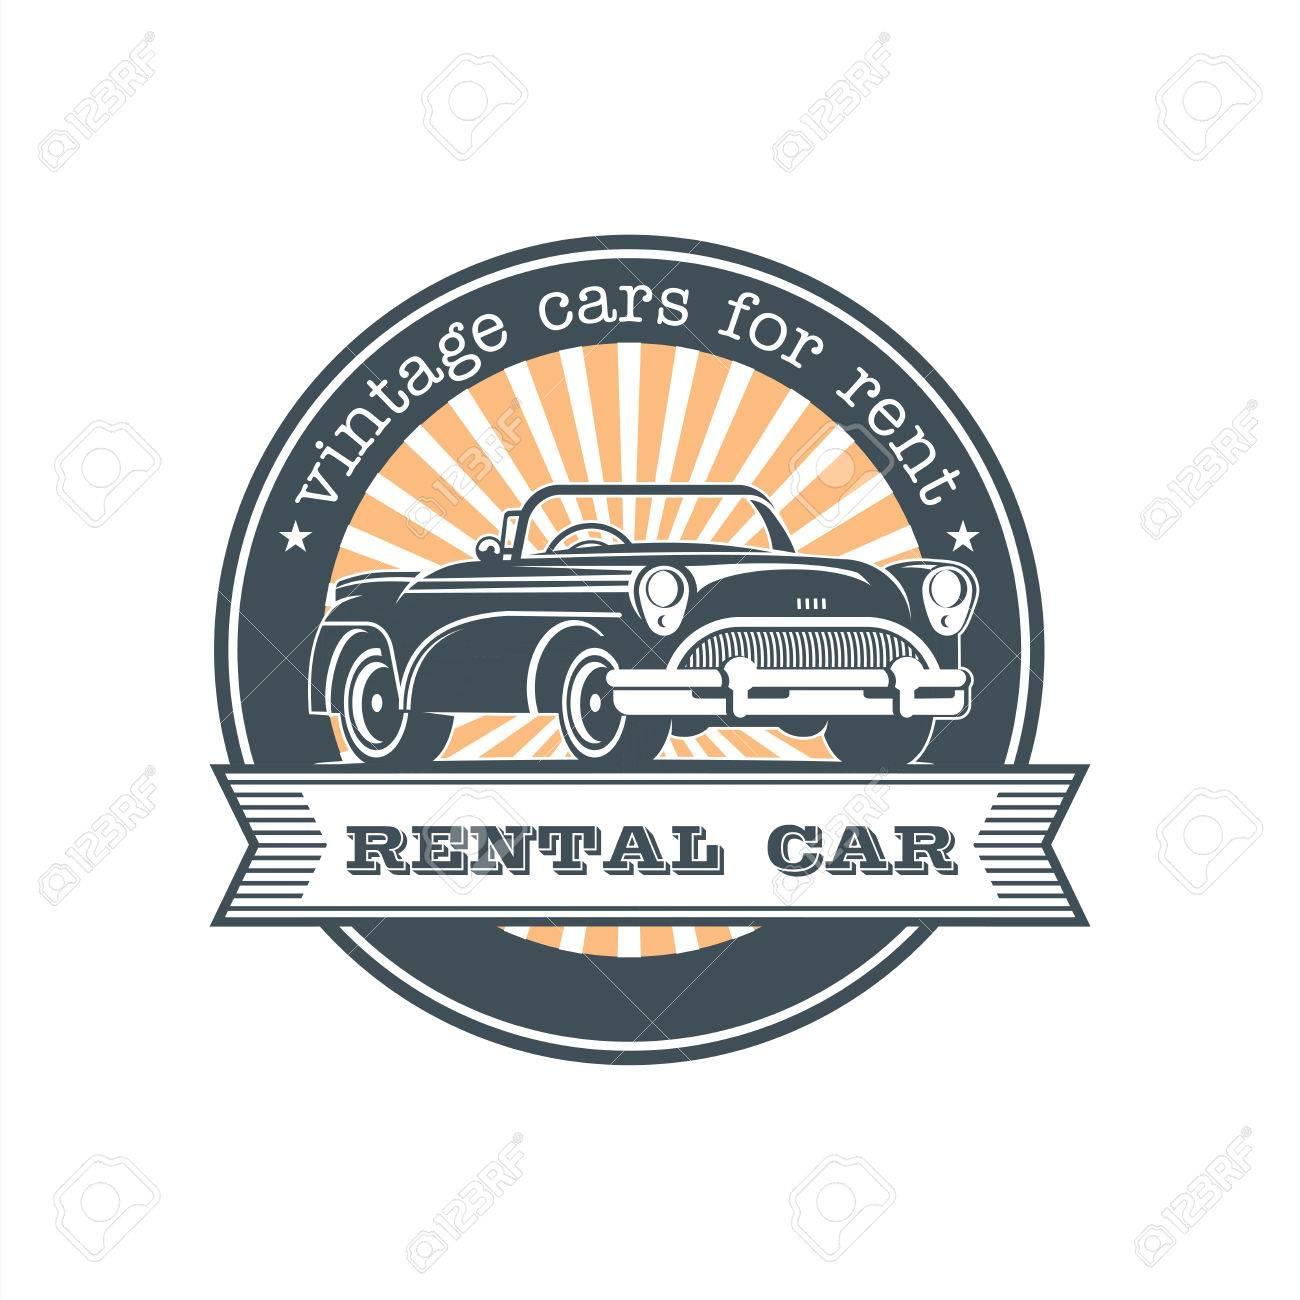 Vintage Car Rental Vector Logo Emblem Royalty Free Cliparts Vectors And Stock Illustration Image 86092024